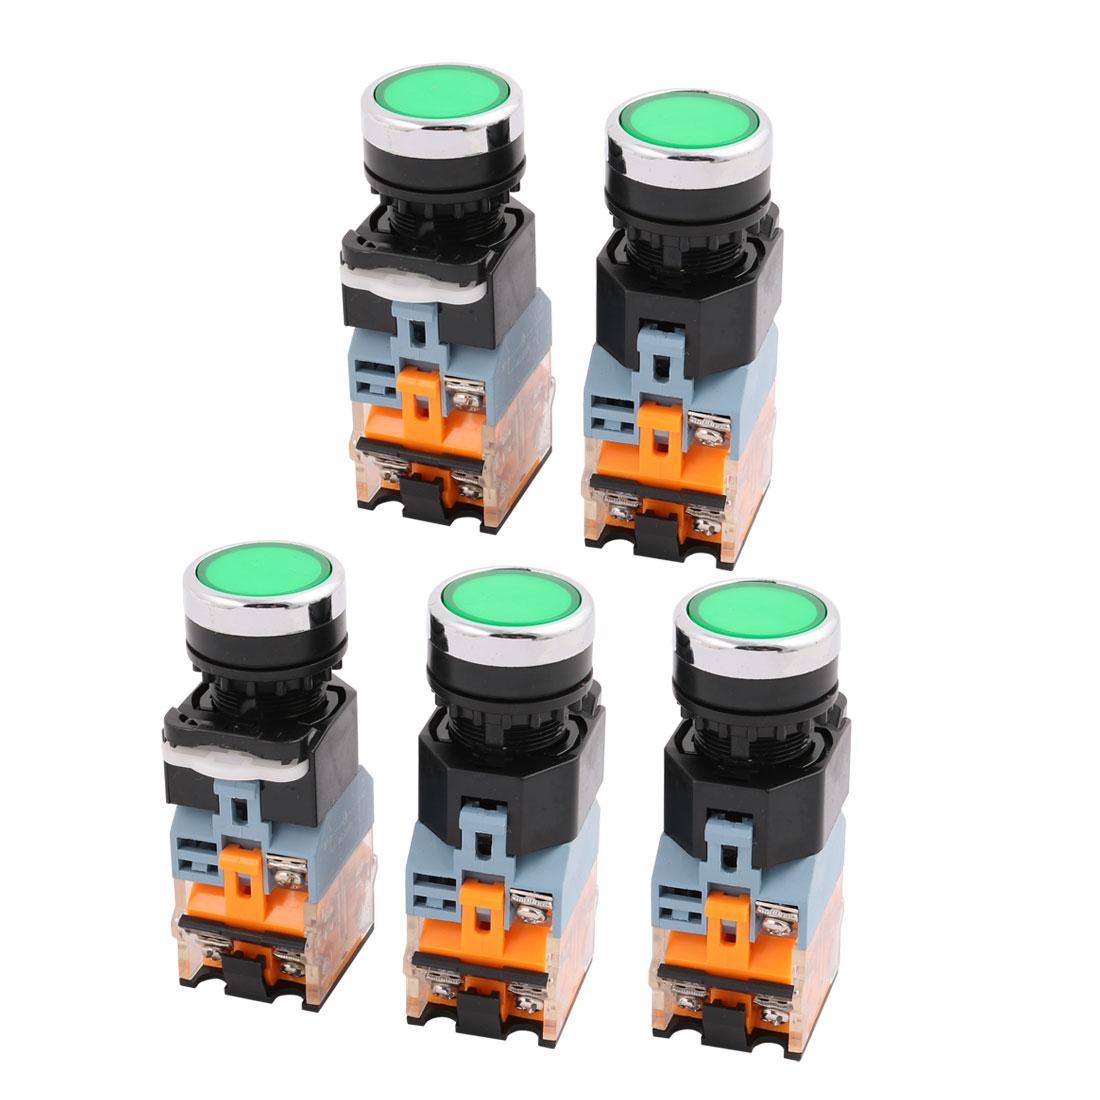 5 Pcs 1NO 1NC LED Indicator Self Locking Push Button Switch Ui 400V Ith 10A